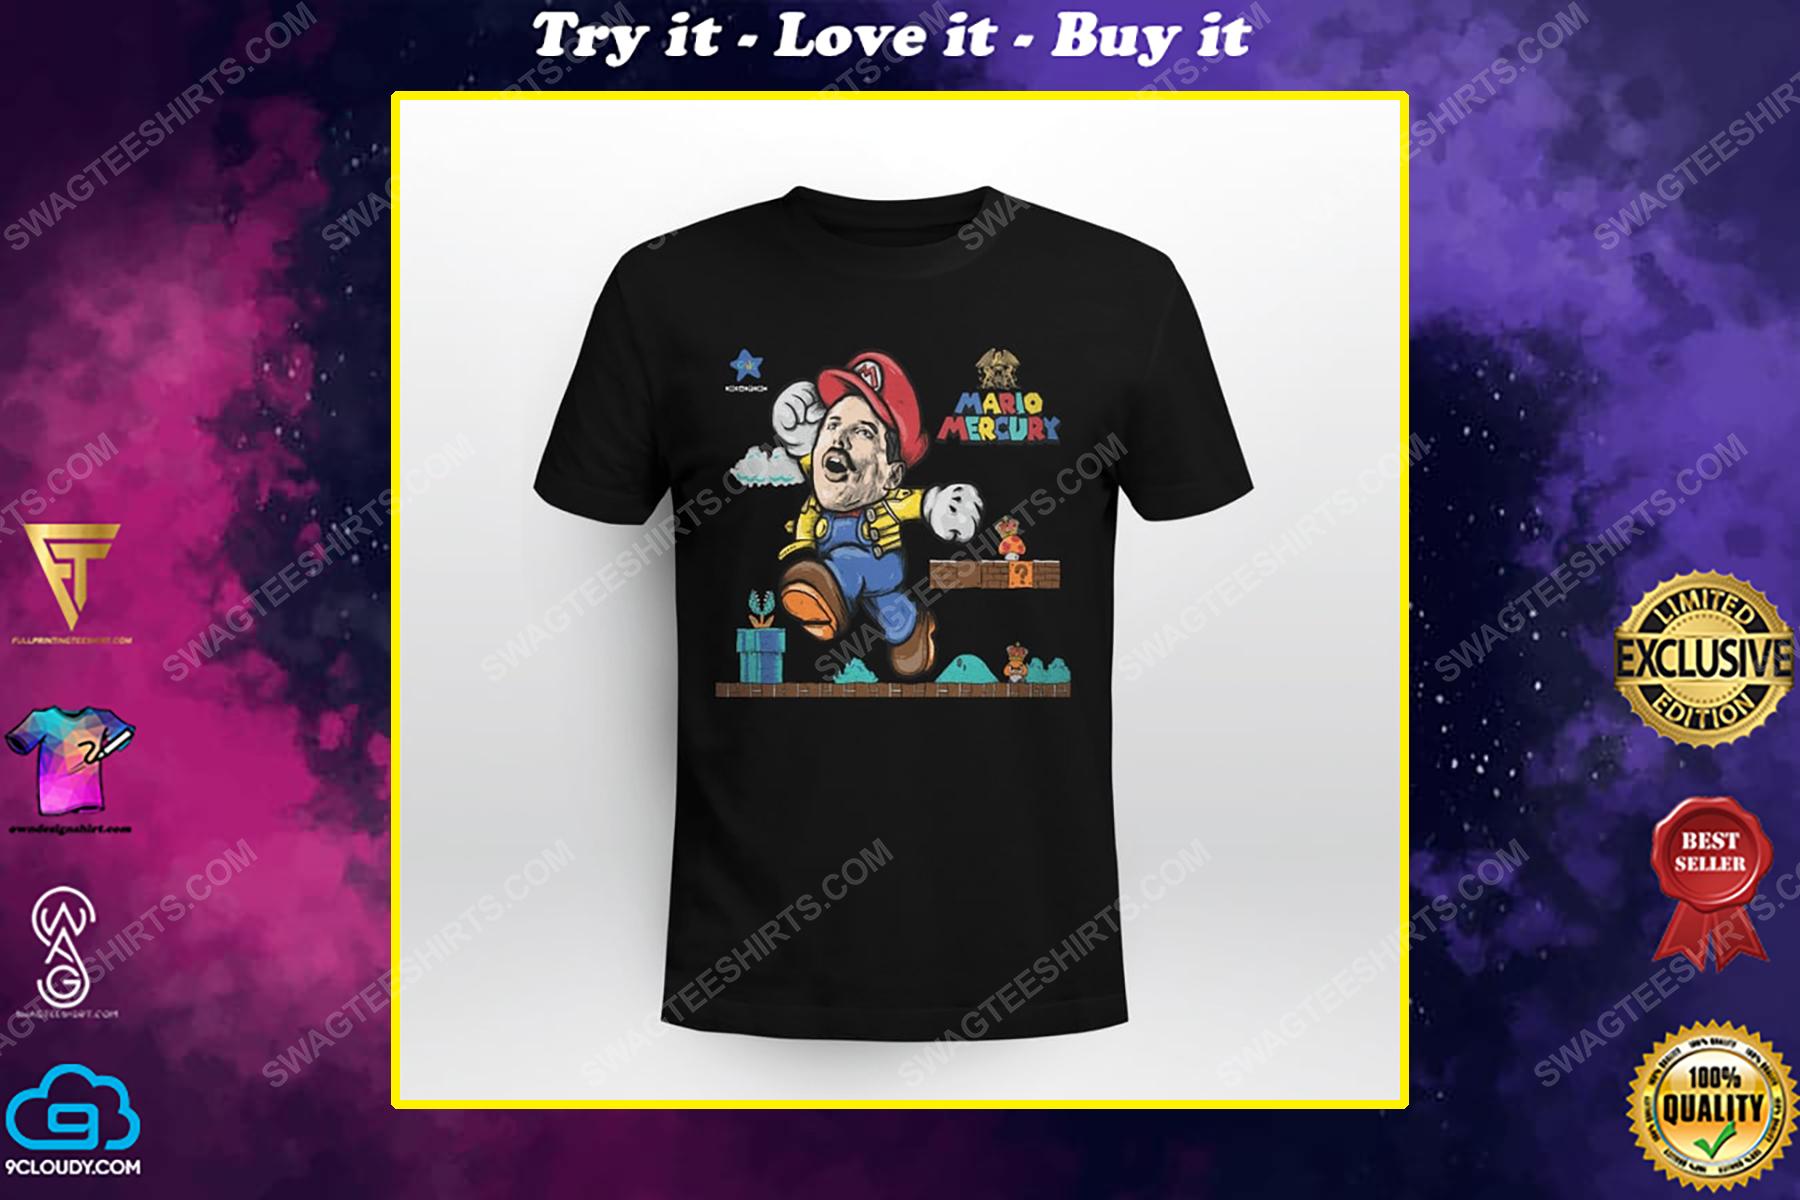 Game super mario and freddie mercury shirt